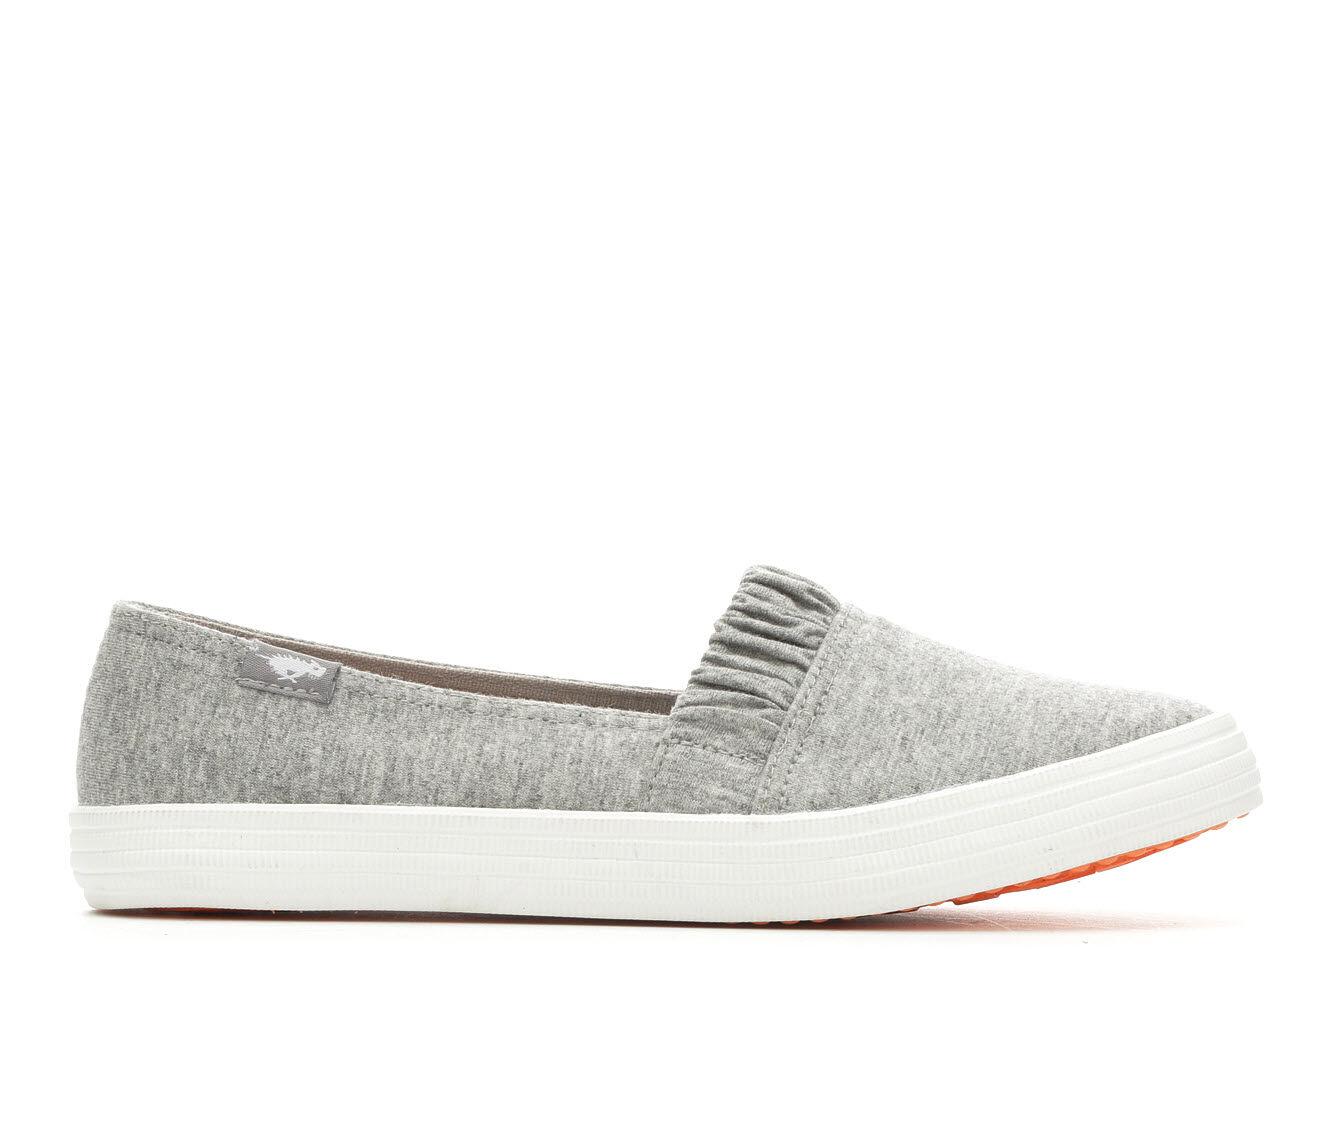 buy online Women's Rocket Dog Chipper Sneakers Light Grey